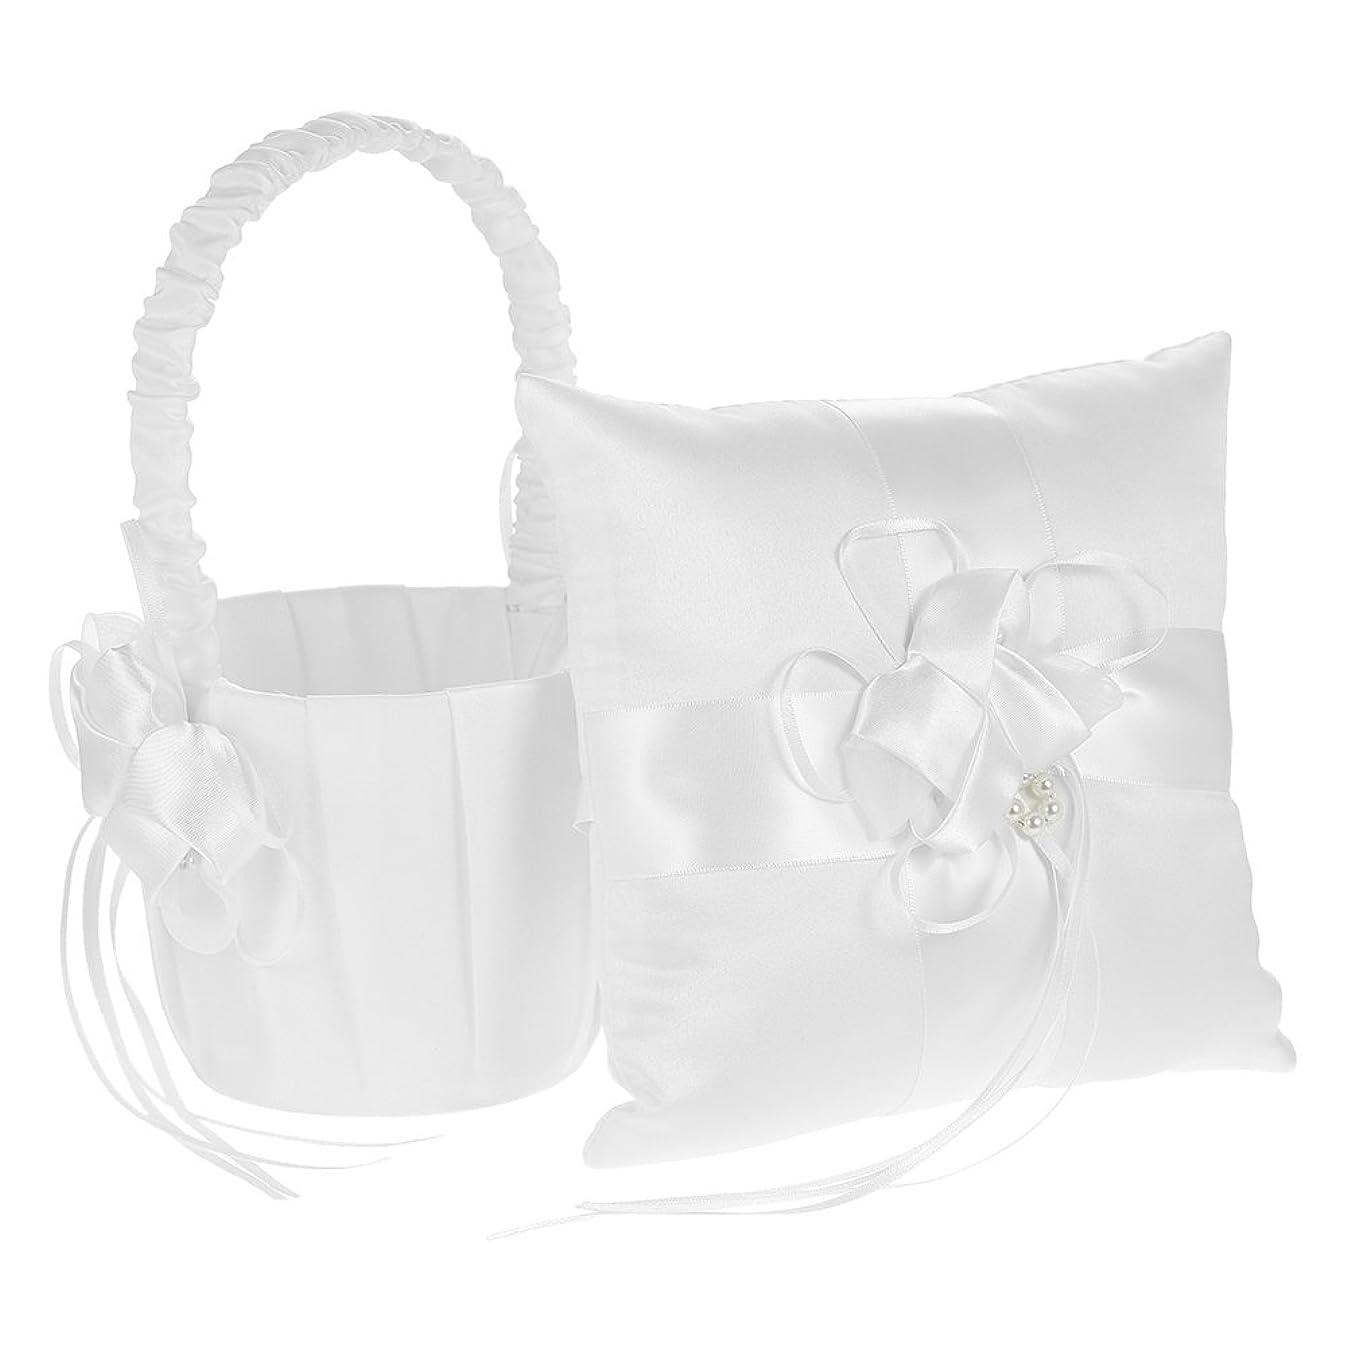 Decdeal Ivory Satin Bowknot Ring Bearer Pillow and Wedding Flower Girl Basket Set, 7 x 7 inches, White (Flower)